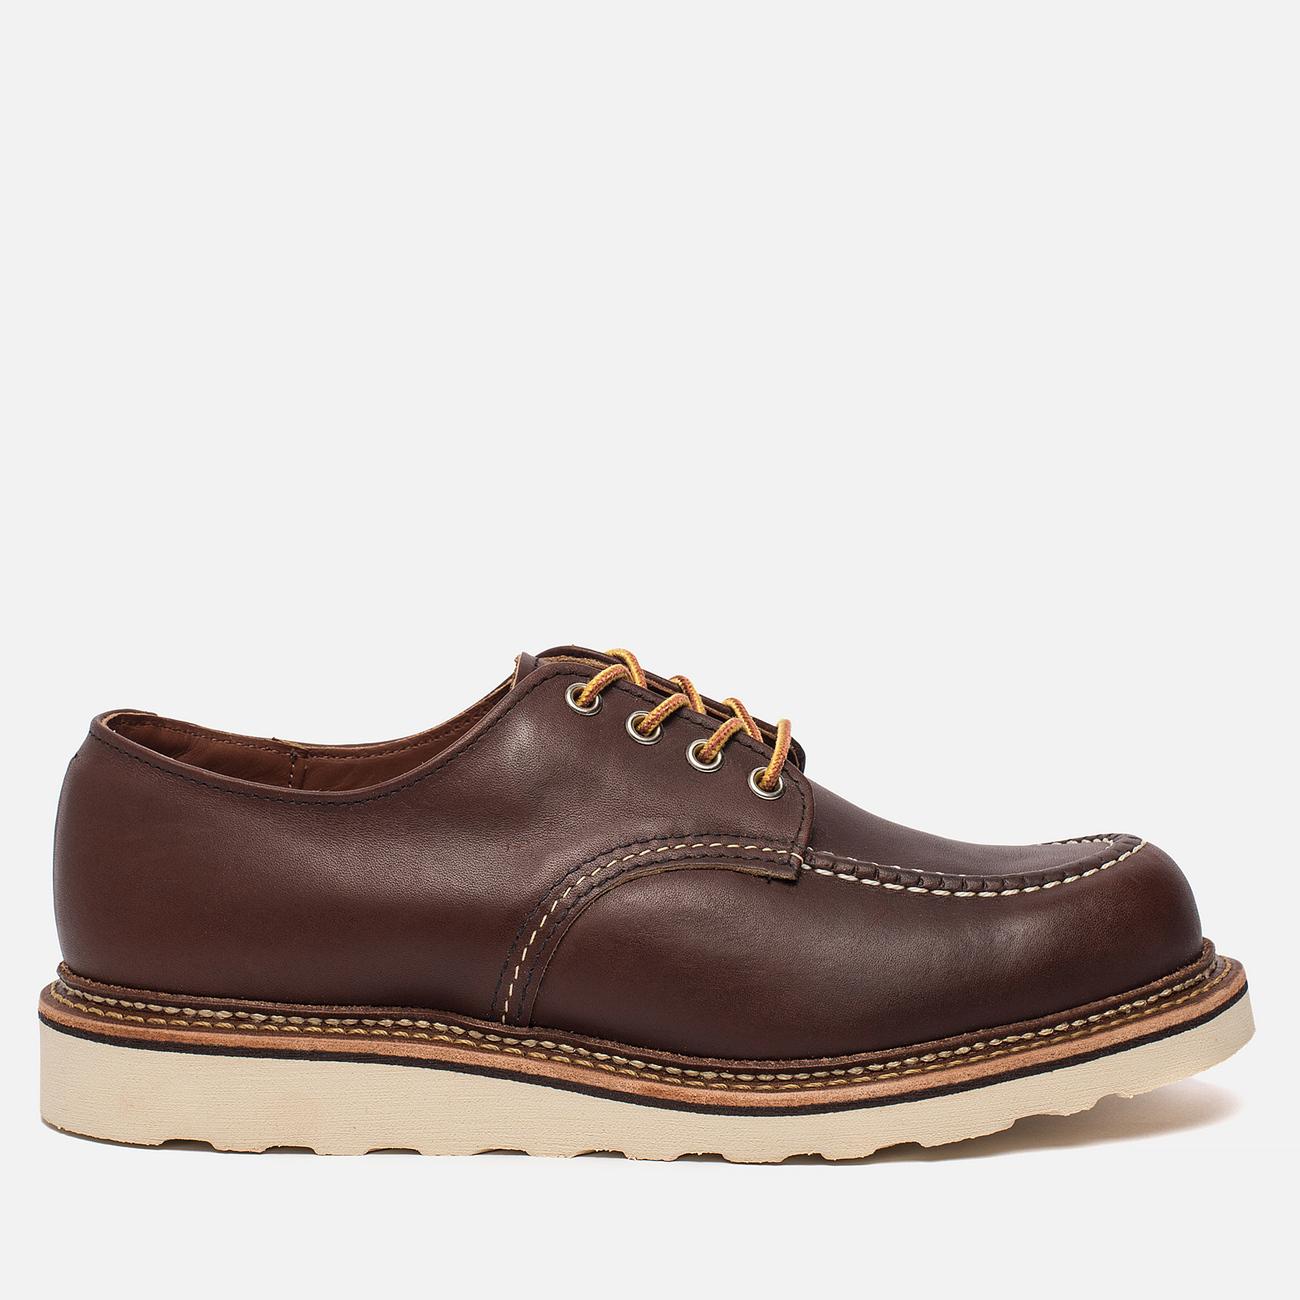 Мужские ботинки Red Wing Shoes 8109 Classic Oxford Leather Mahogany Oro-Iginal